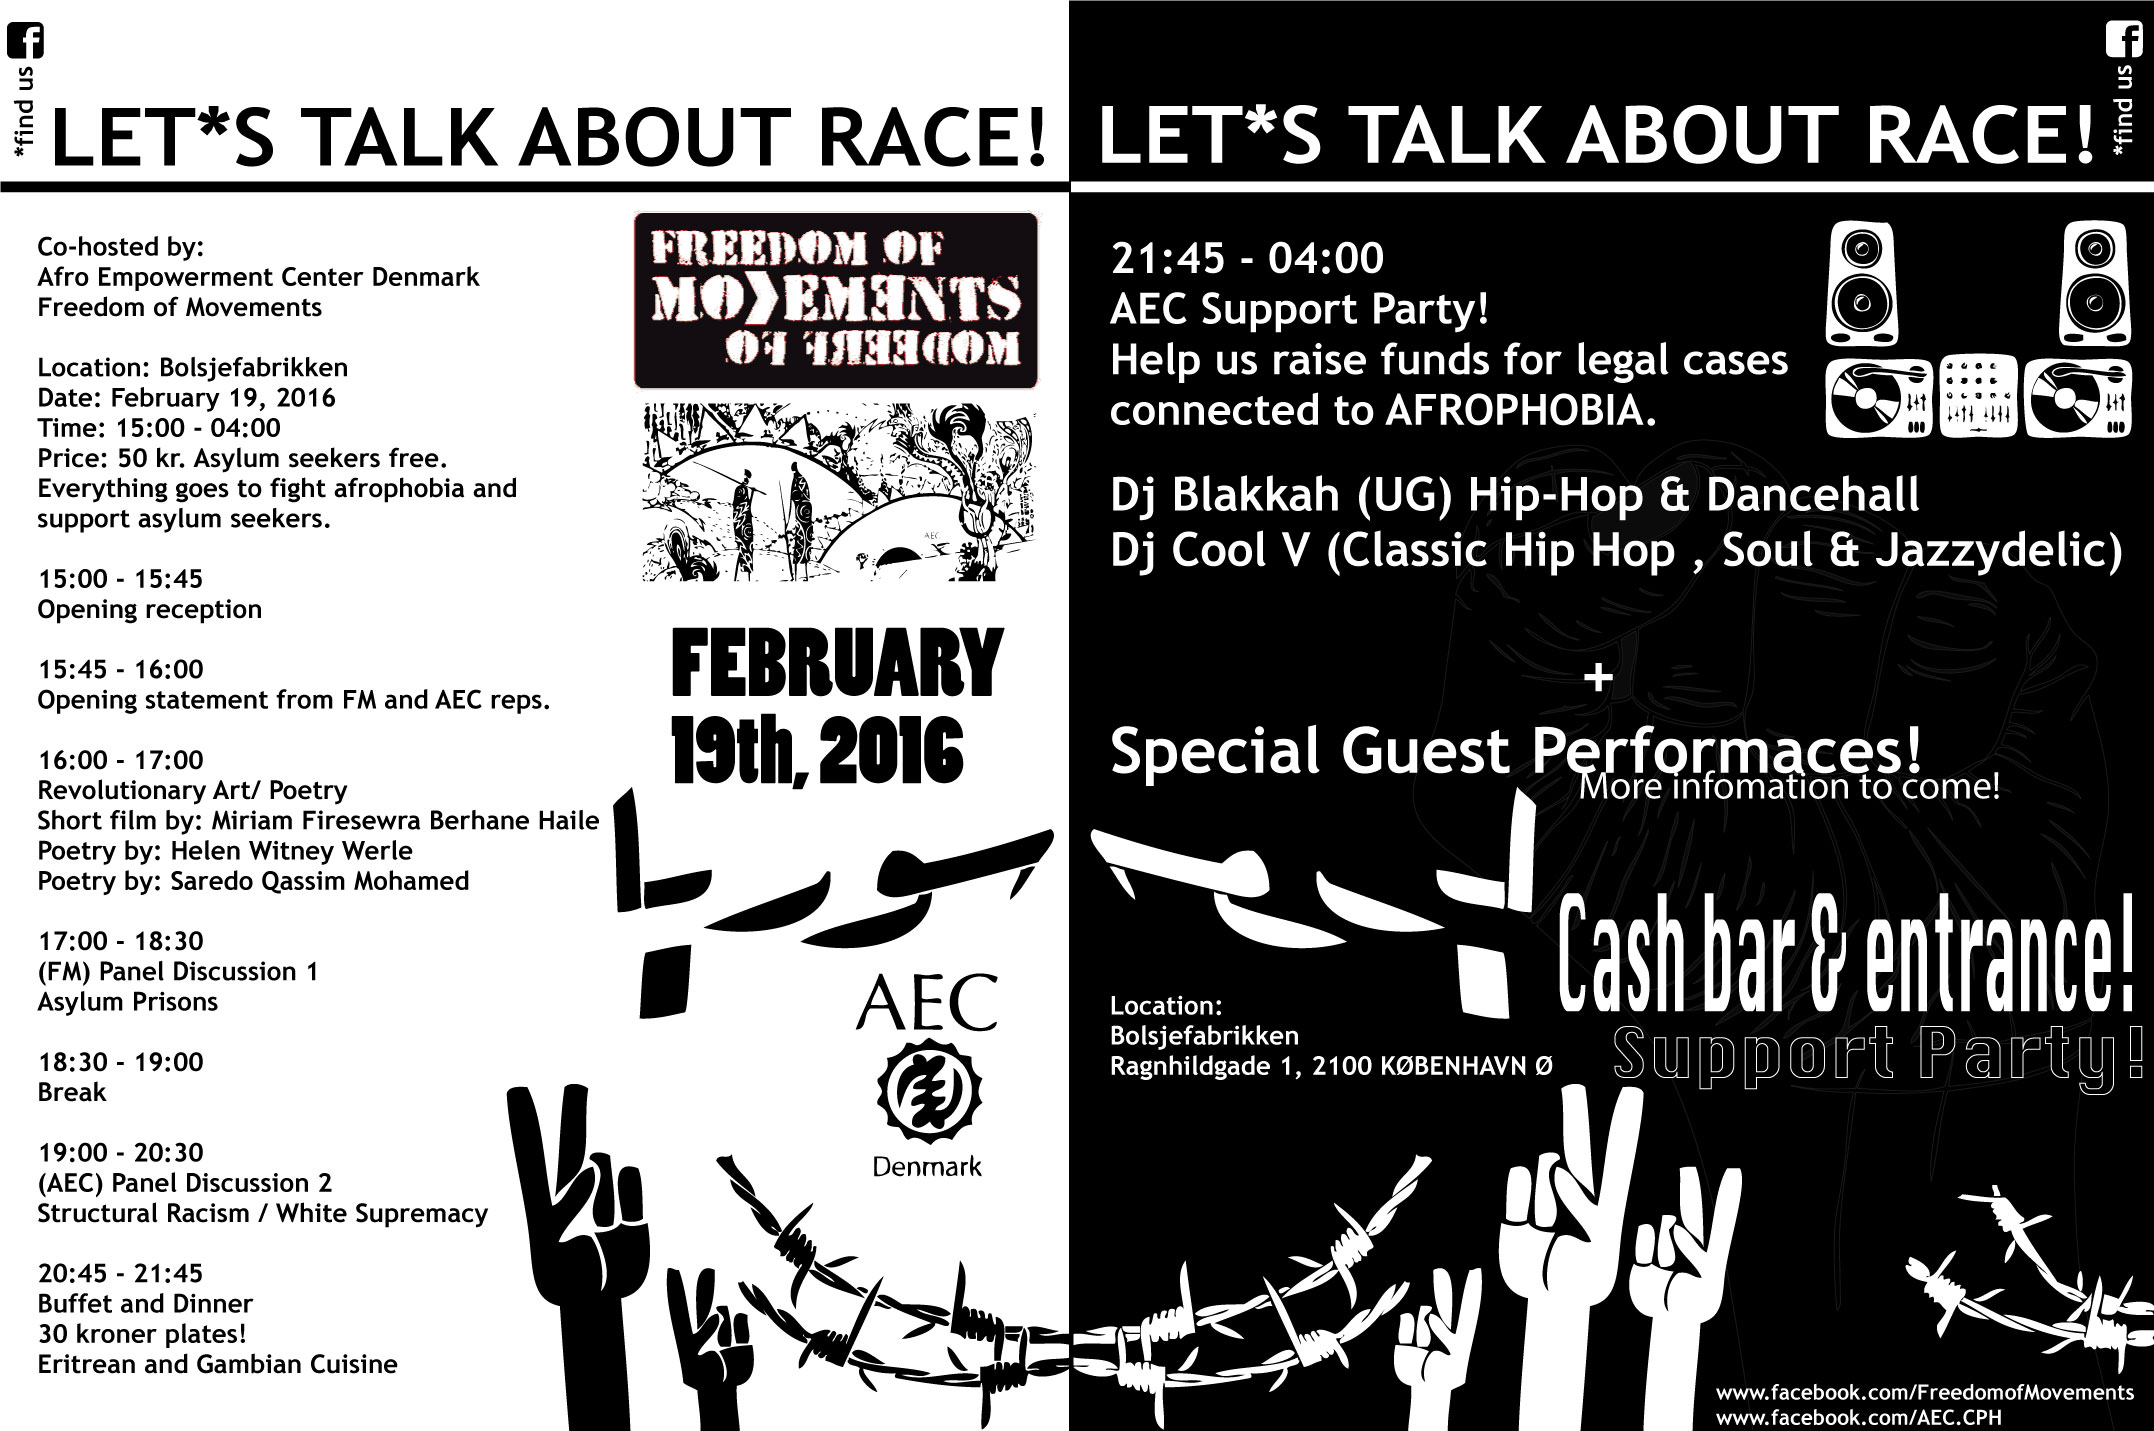 lets-talk-about-race3.jpg